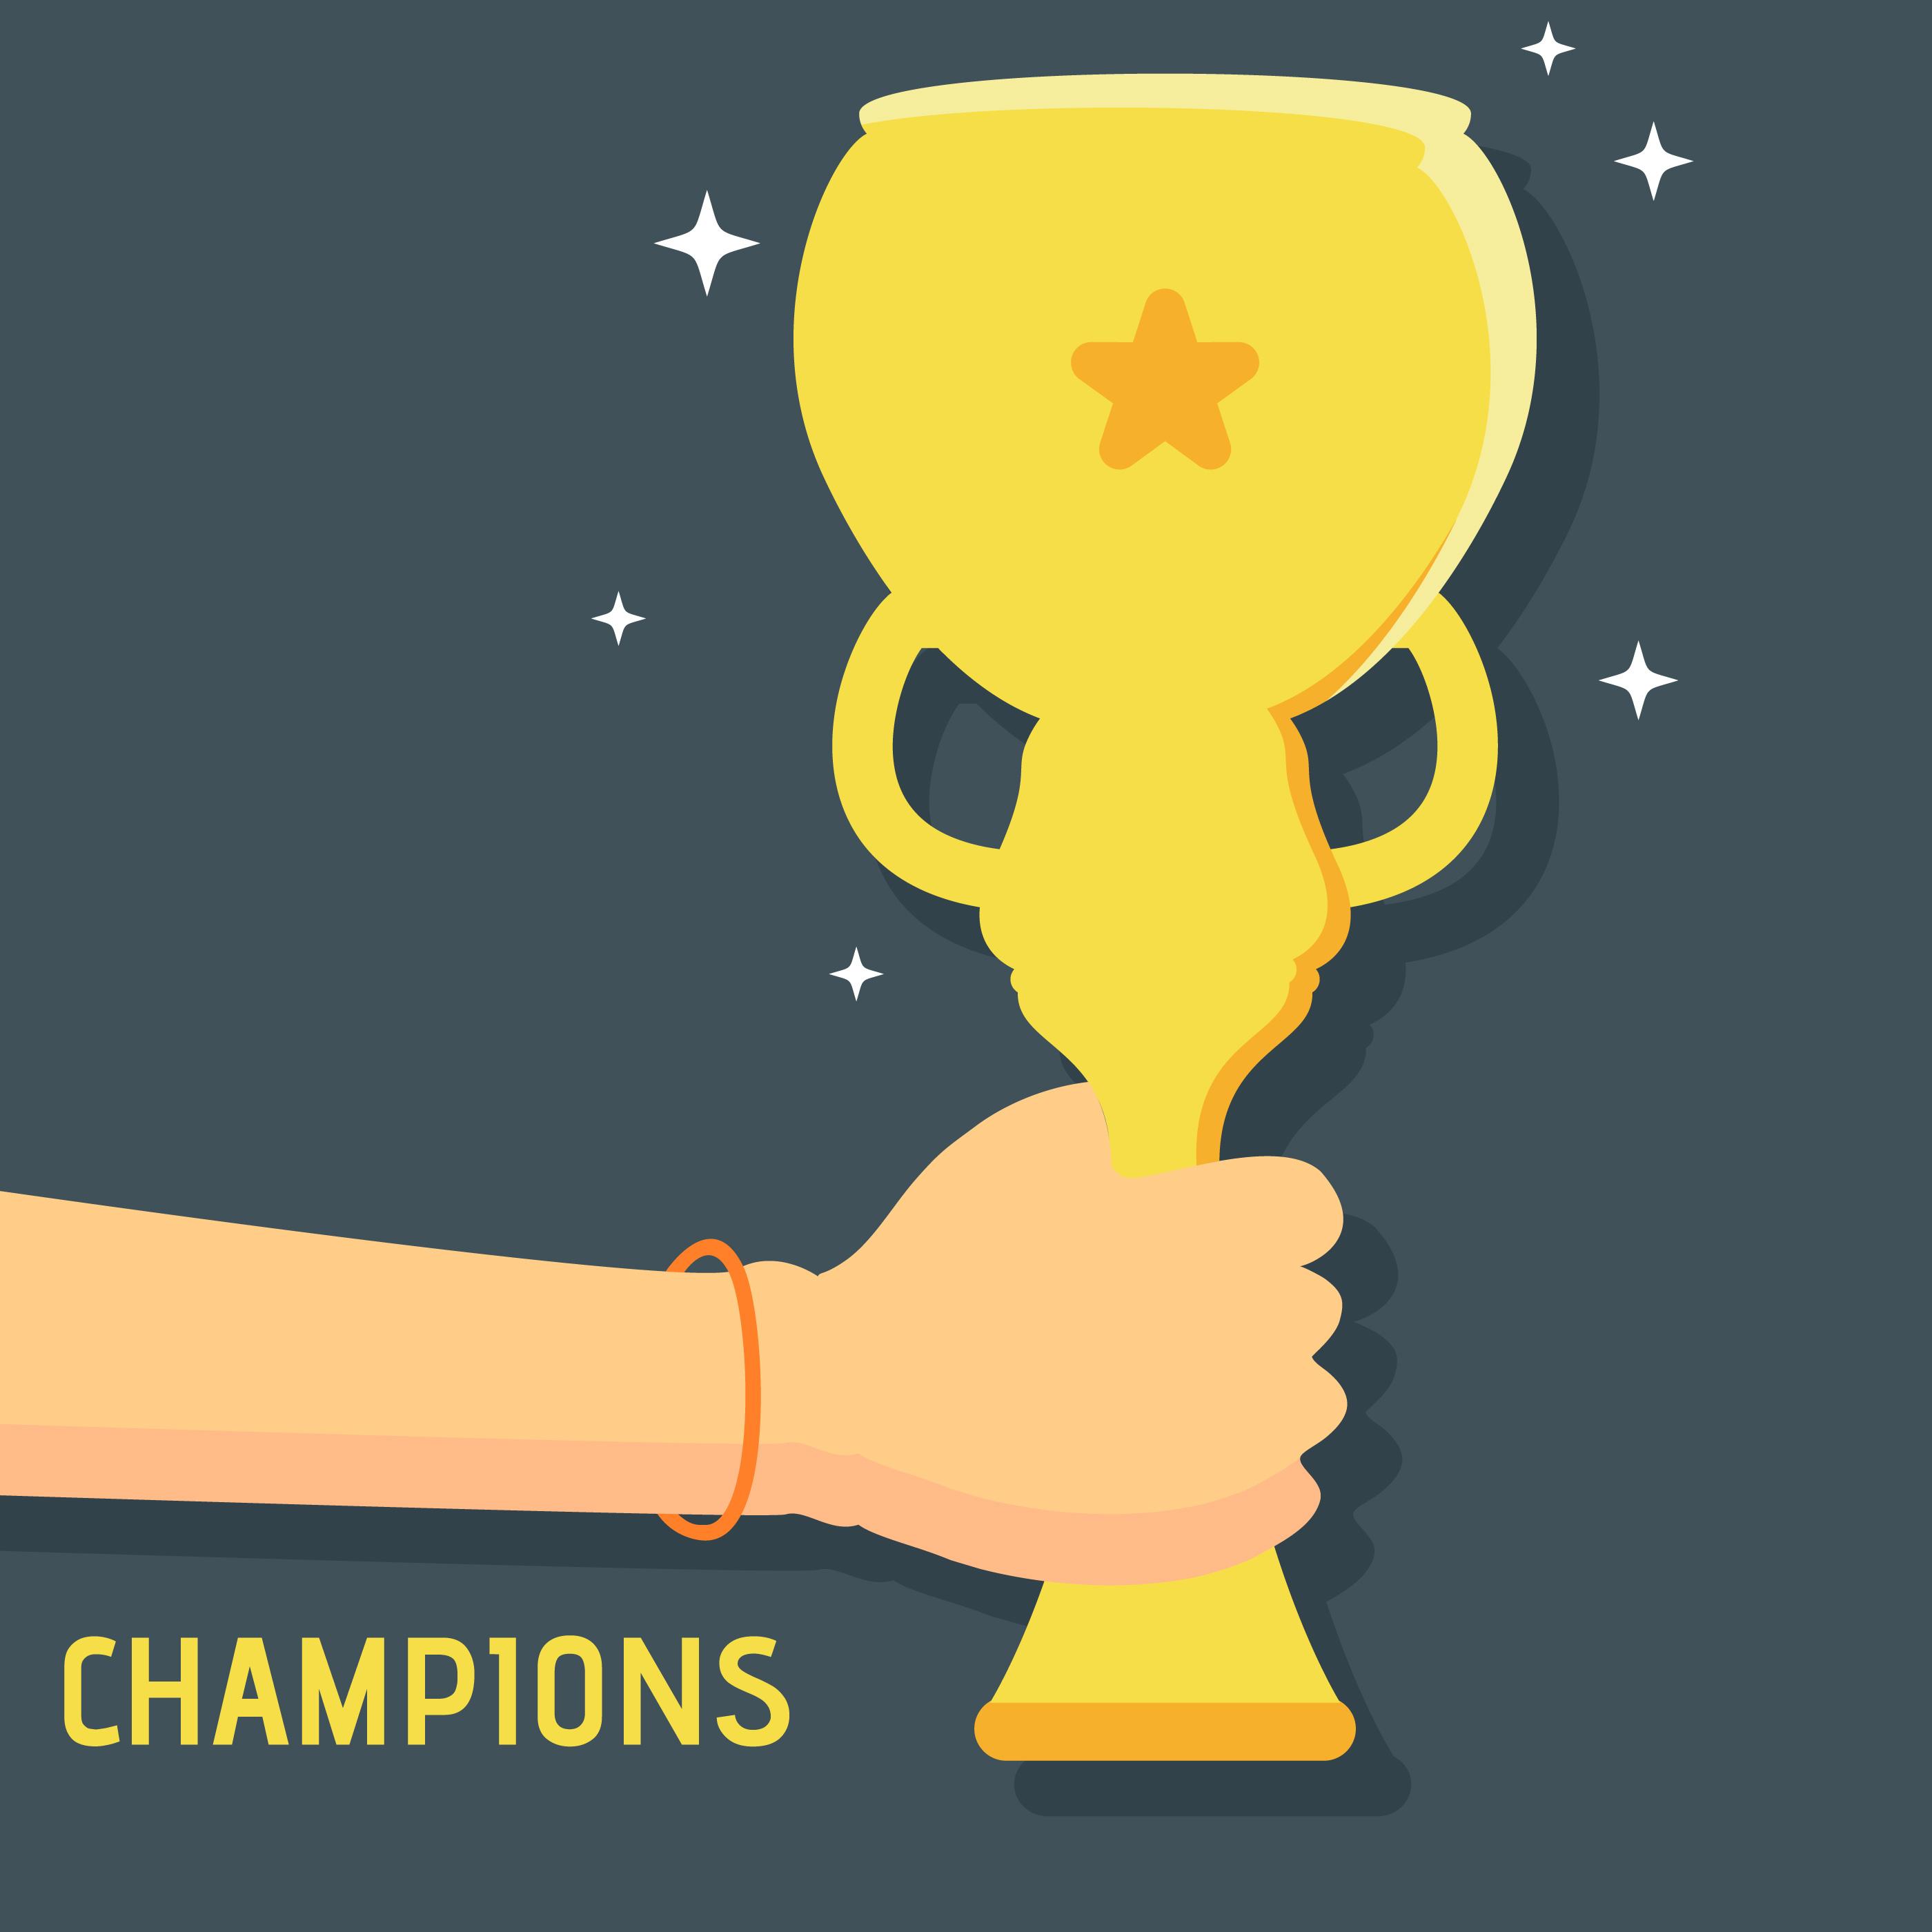 Champions League Vector: Champions Trophy Illustration